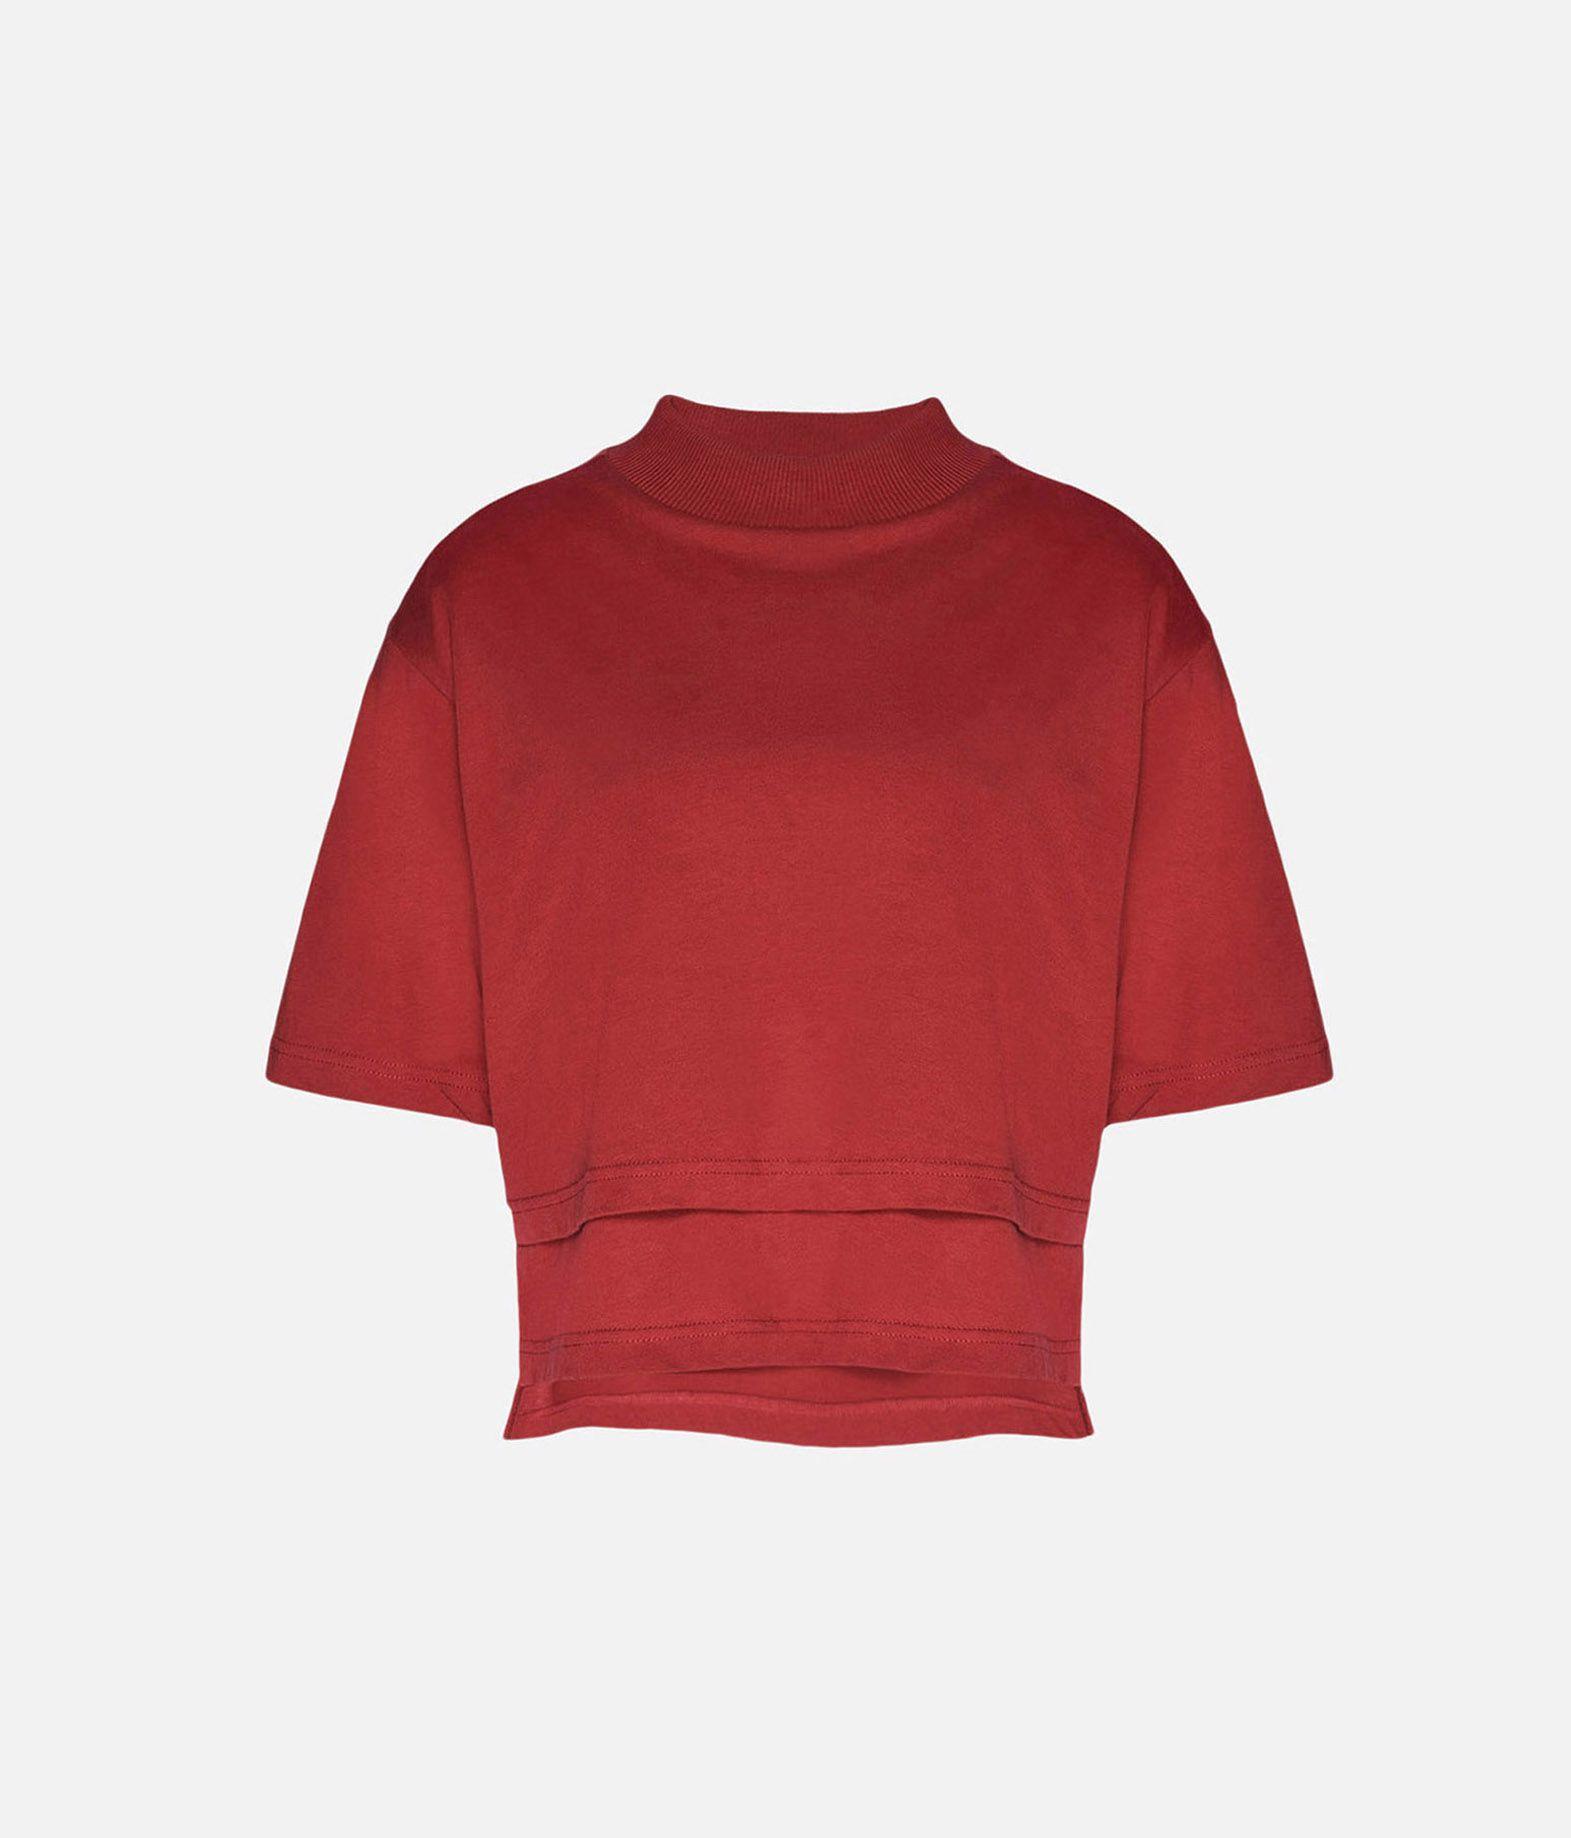 Y-3 Y-3 Signature Long Tee T-shirt maniche corte Donna f